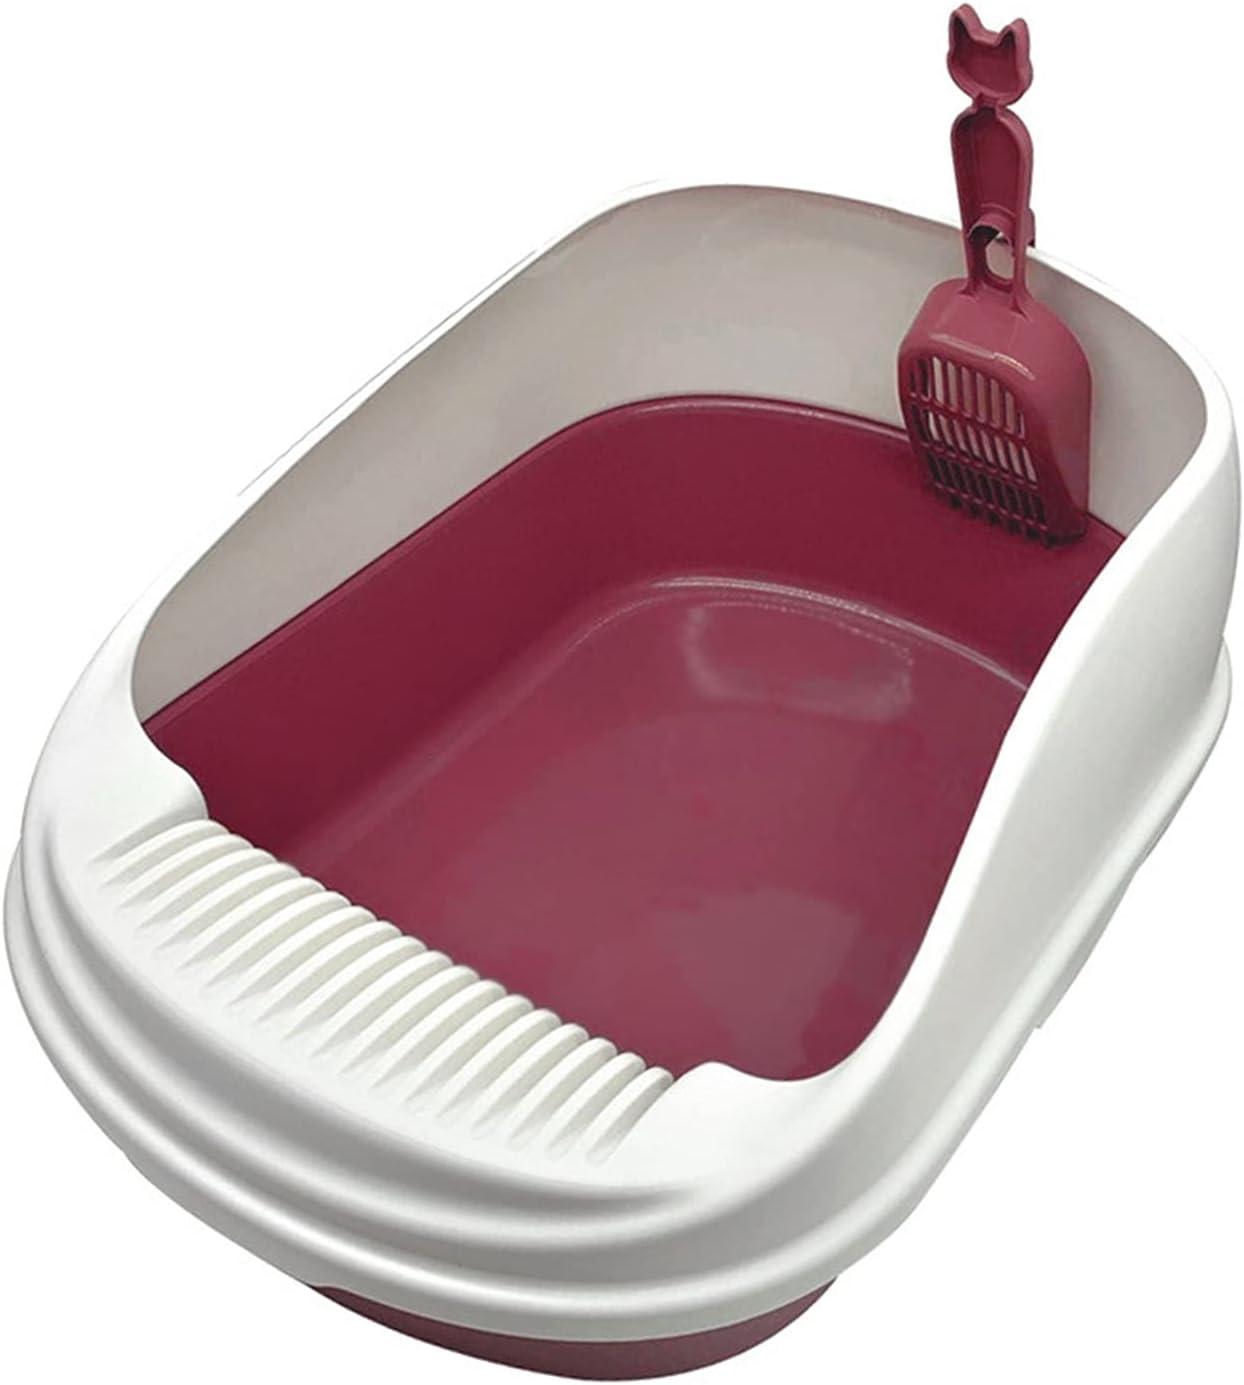 Pet El Paso Mall Price reduction Toilet XL Bedpan Anti Splash Cats Tray Box wi Cat Litter Dog